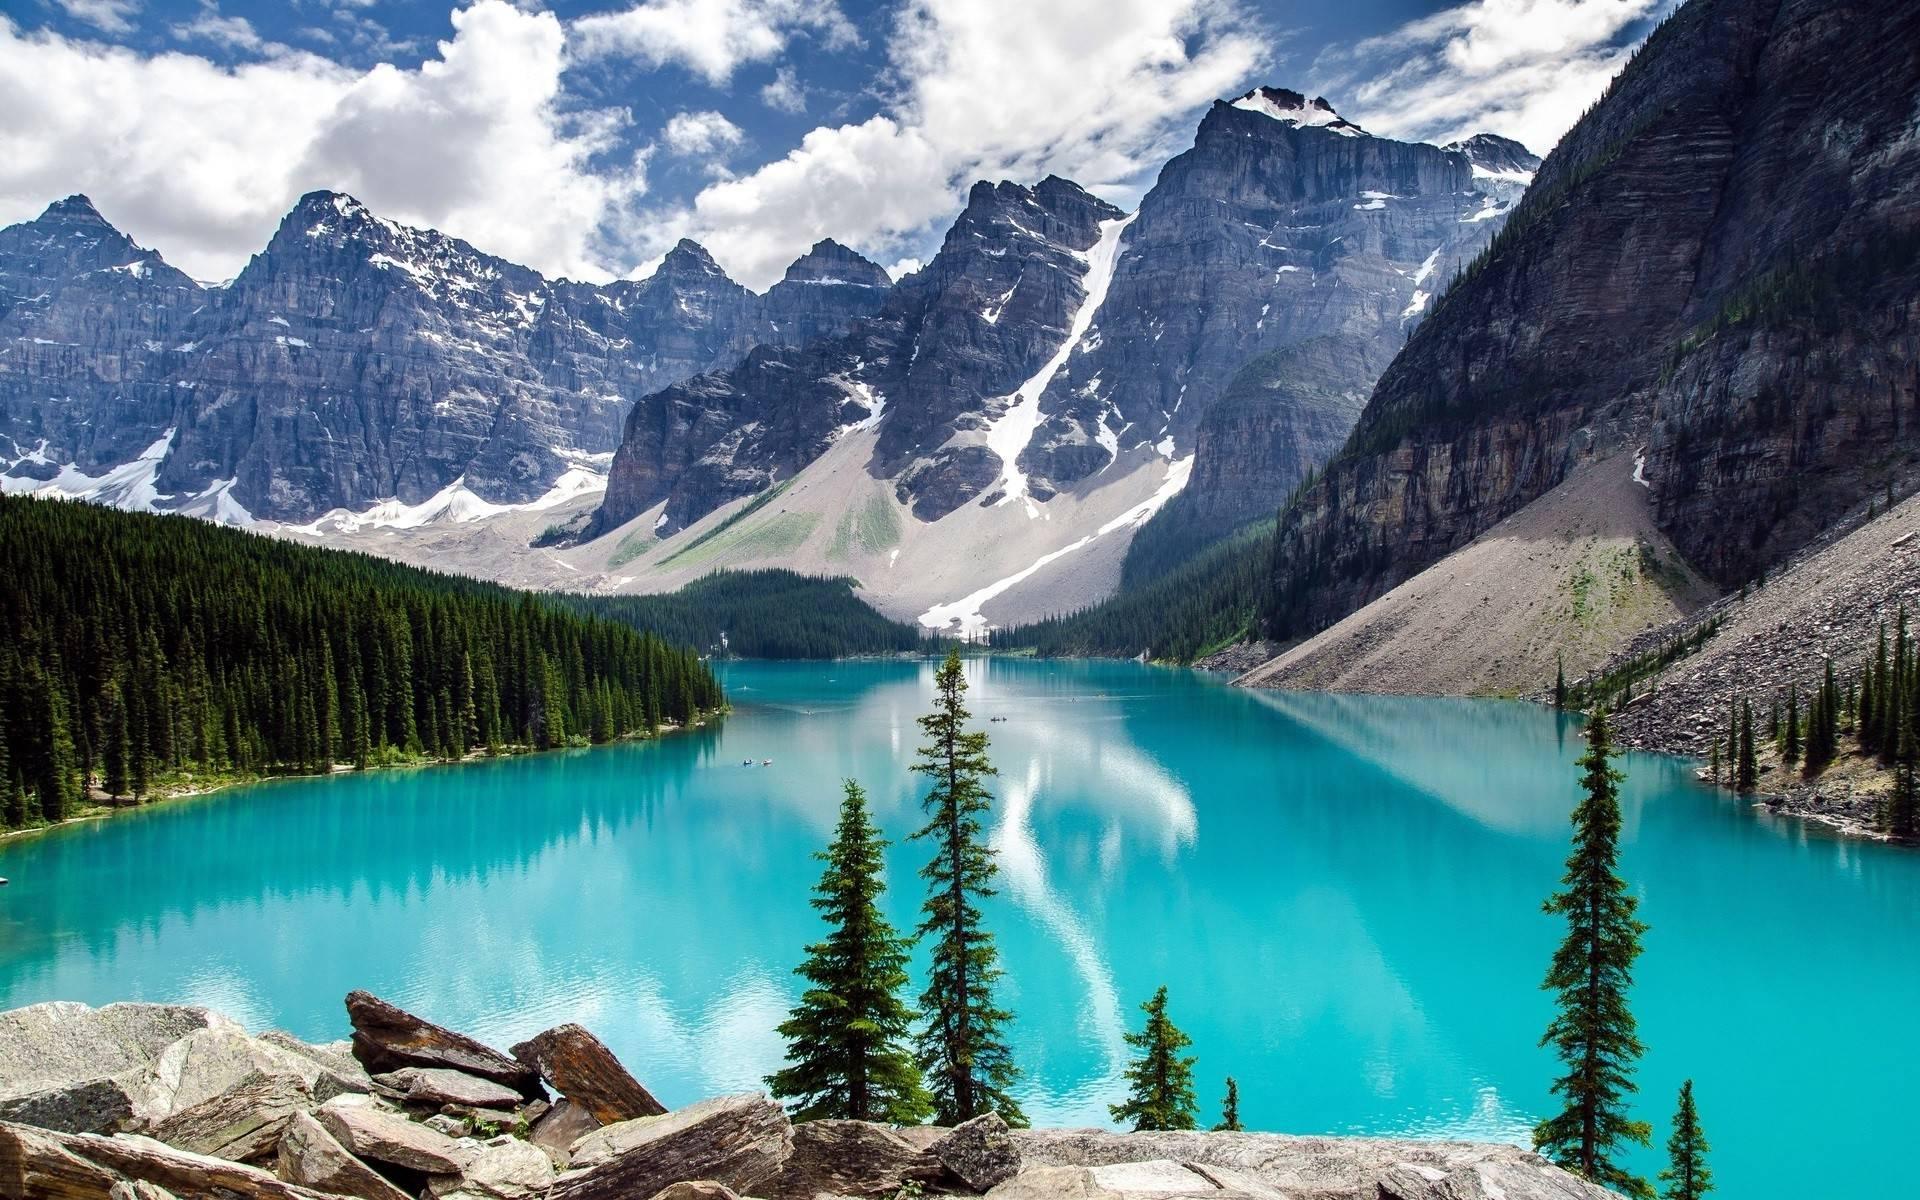 Moraine Lake Banff National Park Alberta Canada [1920x1200] x post 1920x1200